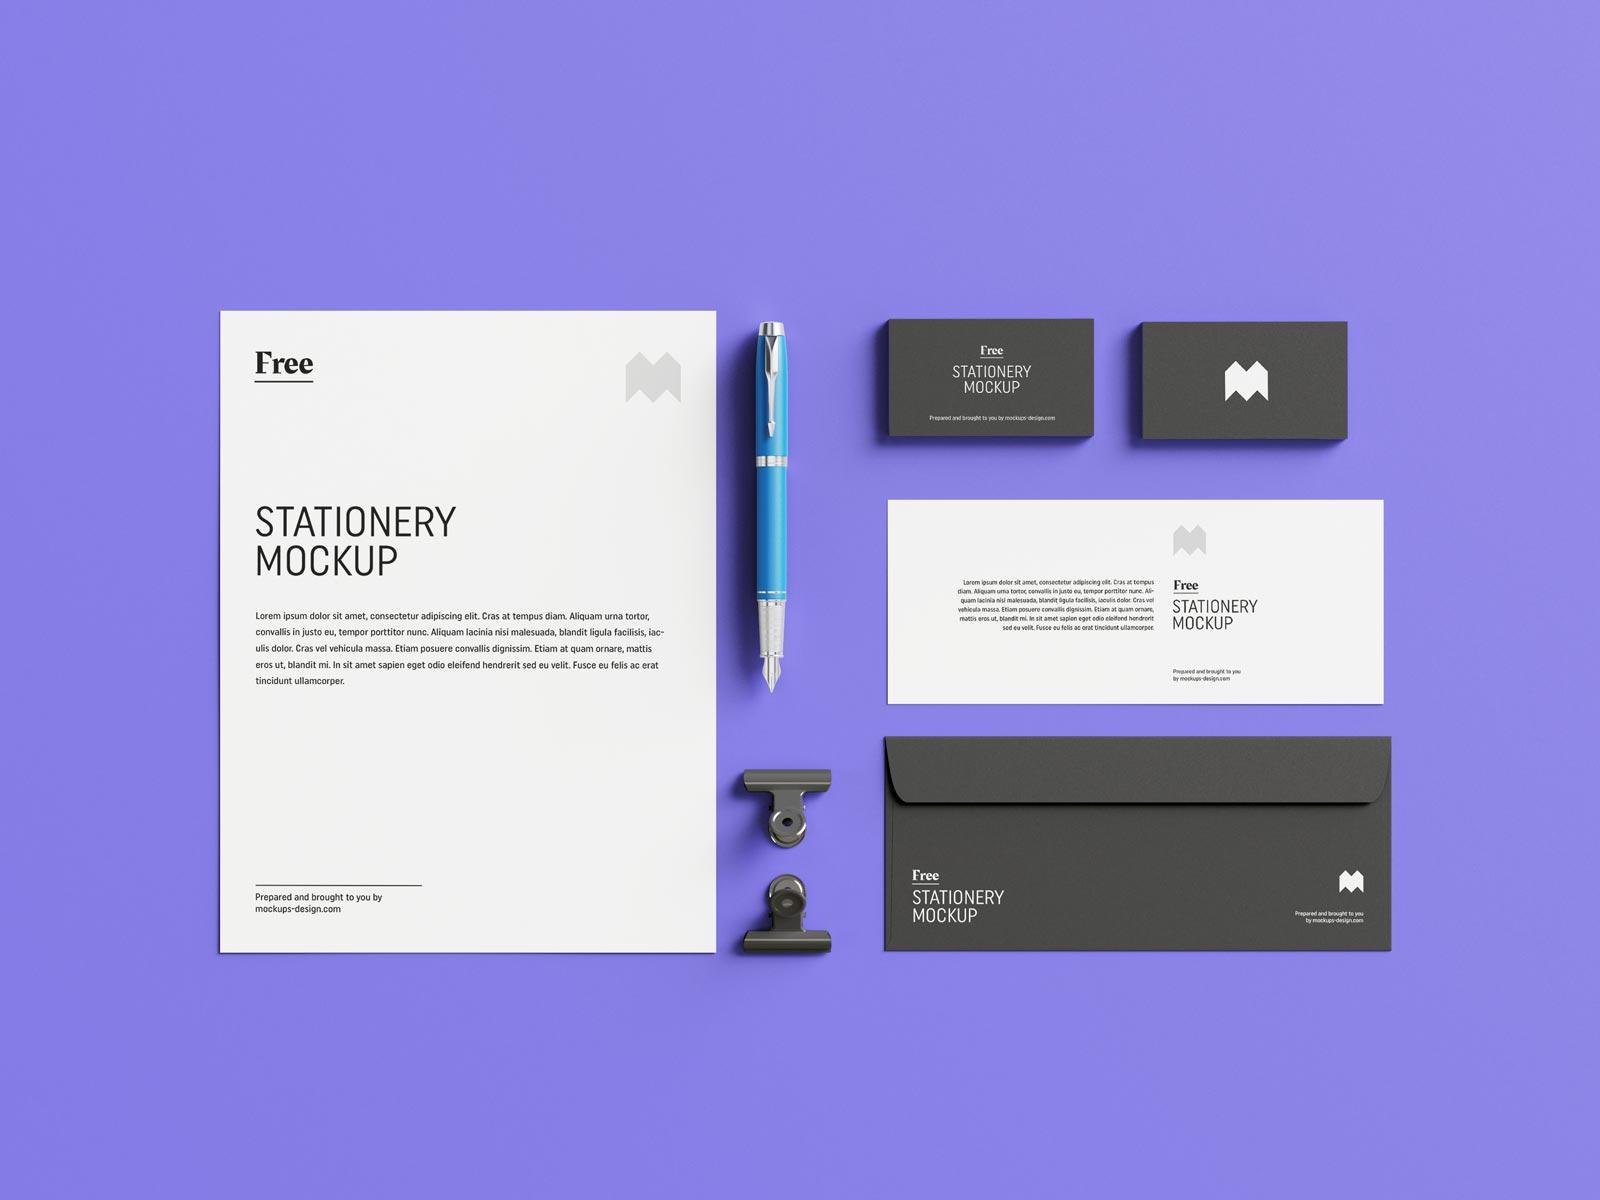 Free-US-Stationary-Mockup-PSD-Set